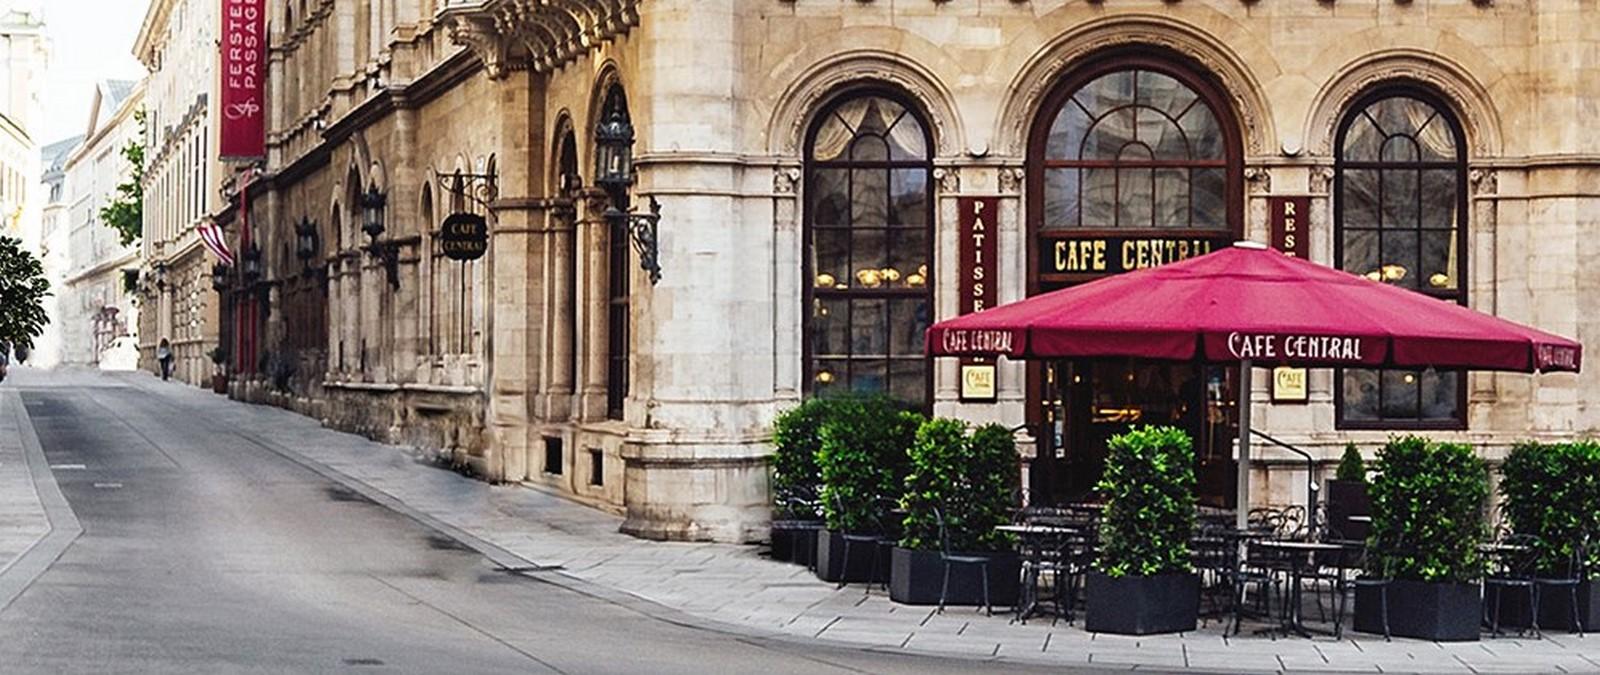 Café Central, Vienna: The Chess School - Sheet9